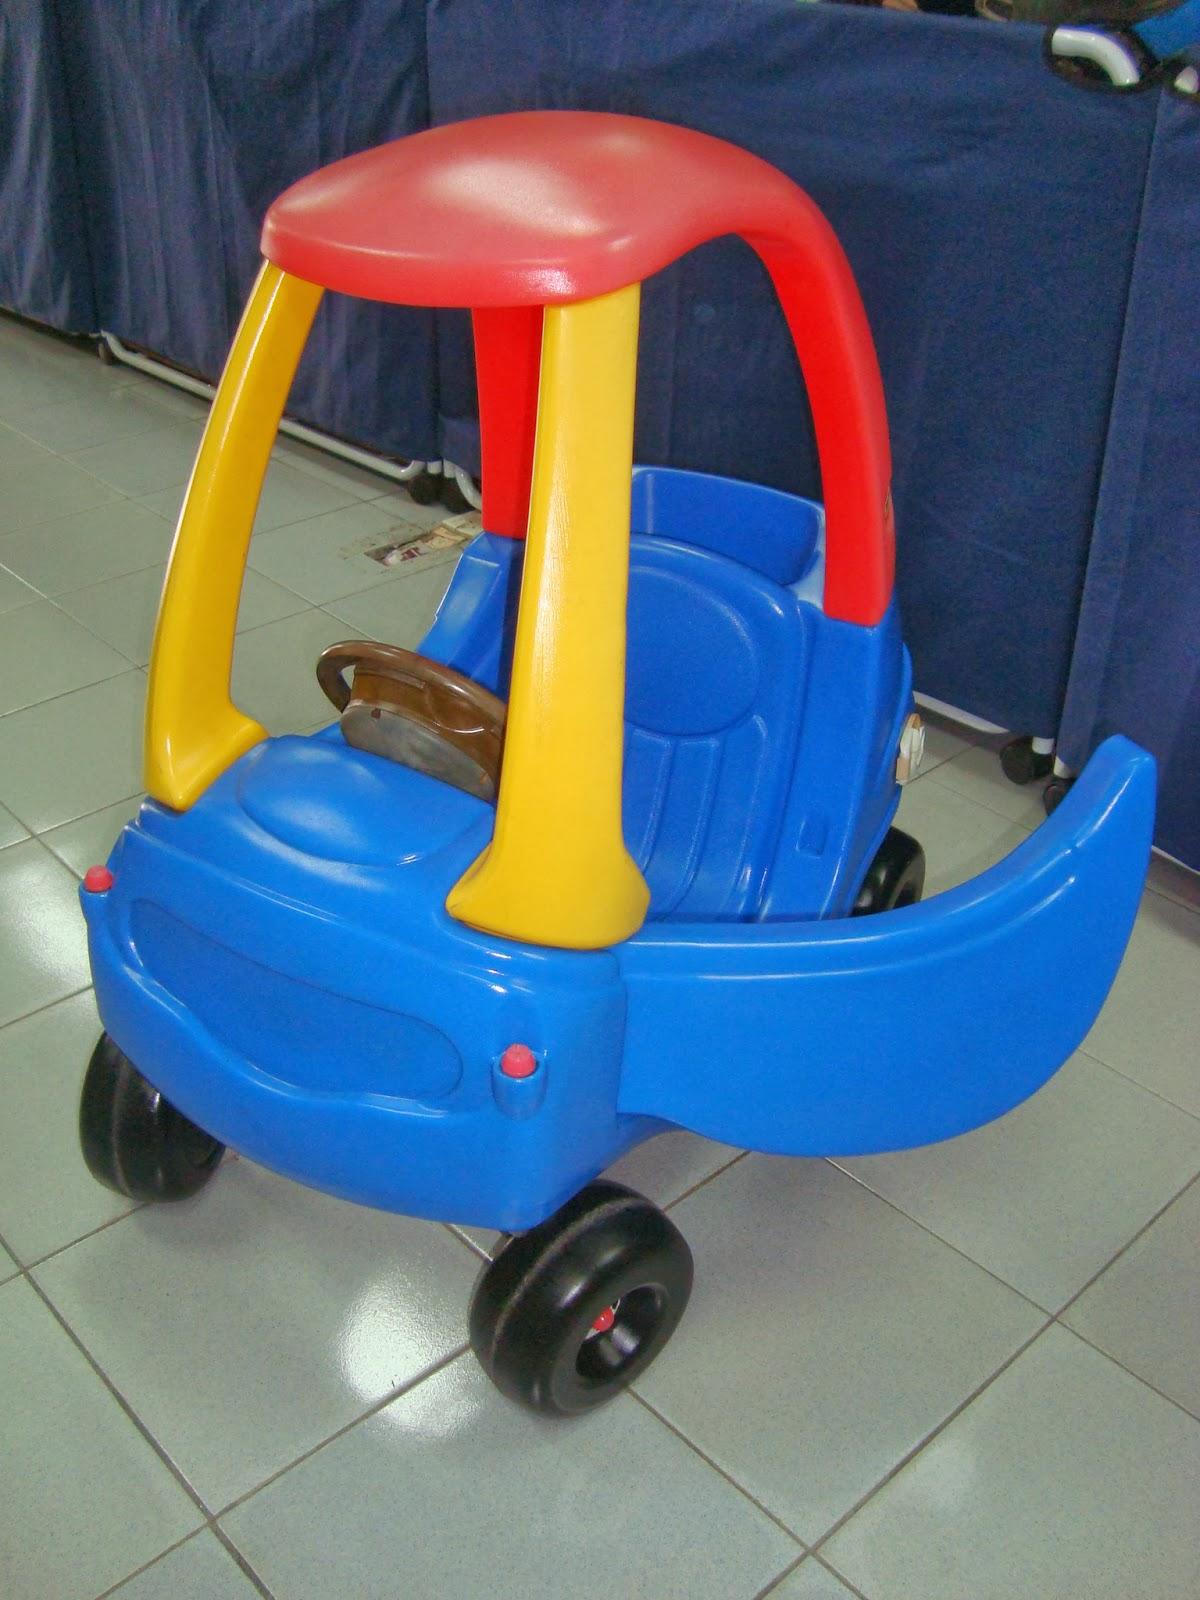 Best Little Tikes Toys : Kedai bundle toys thetottoys little tikes cozy coupe ride on